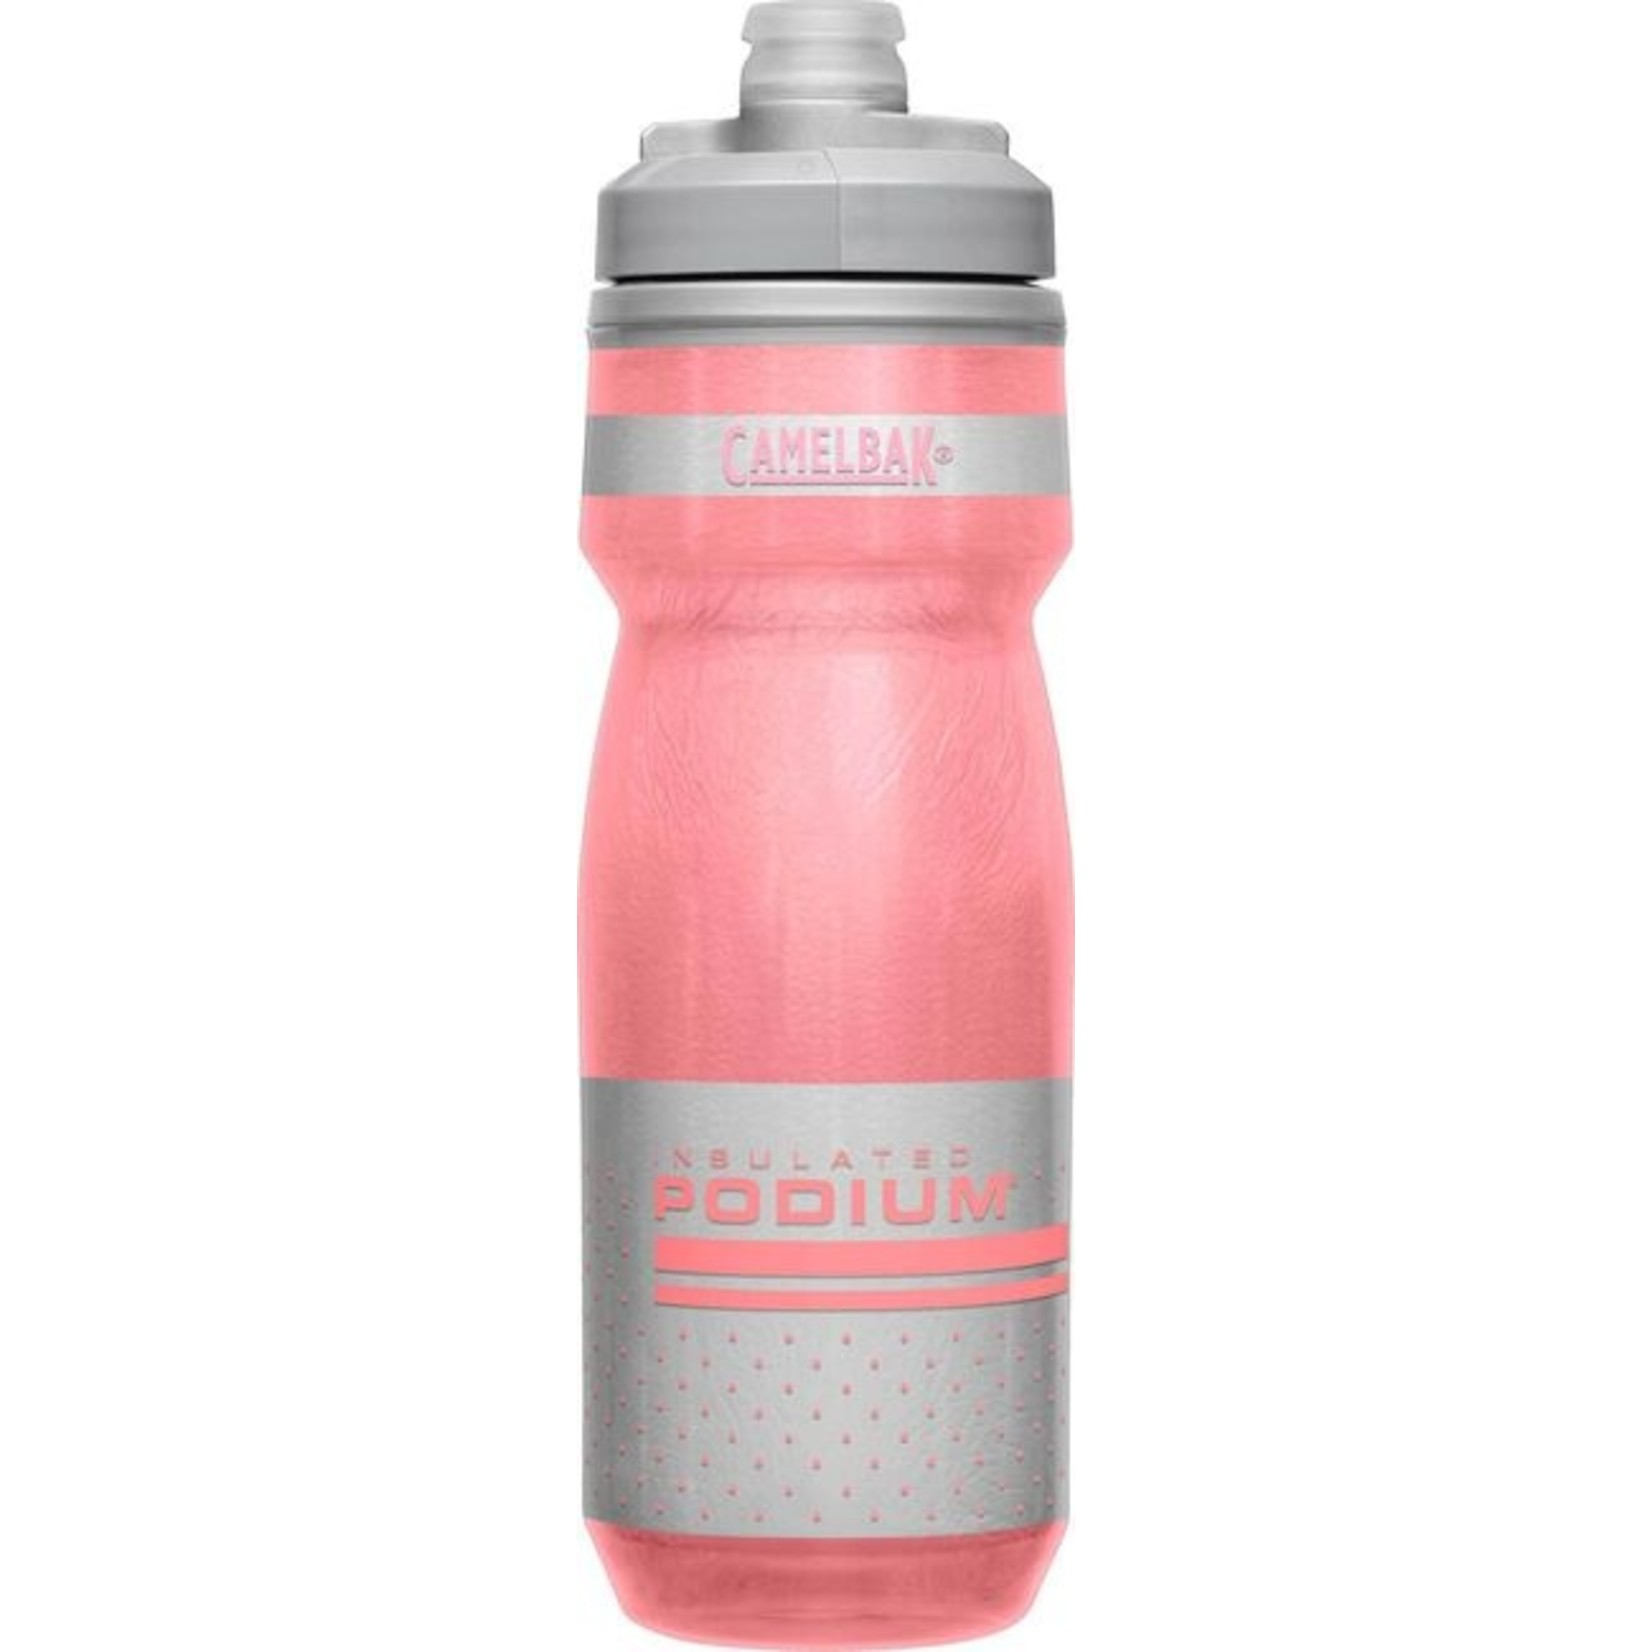 Camelbak Podium Chill 620ml Bike Bottle - Reflective Pink